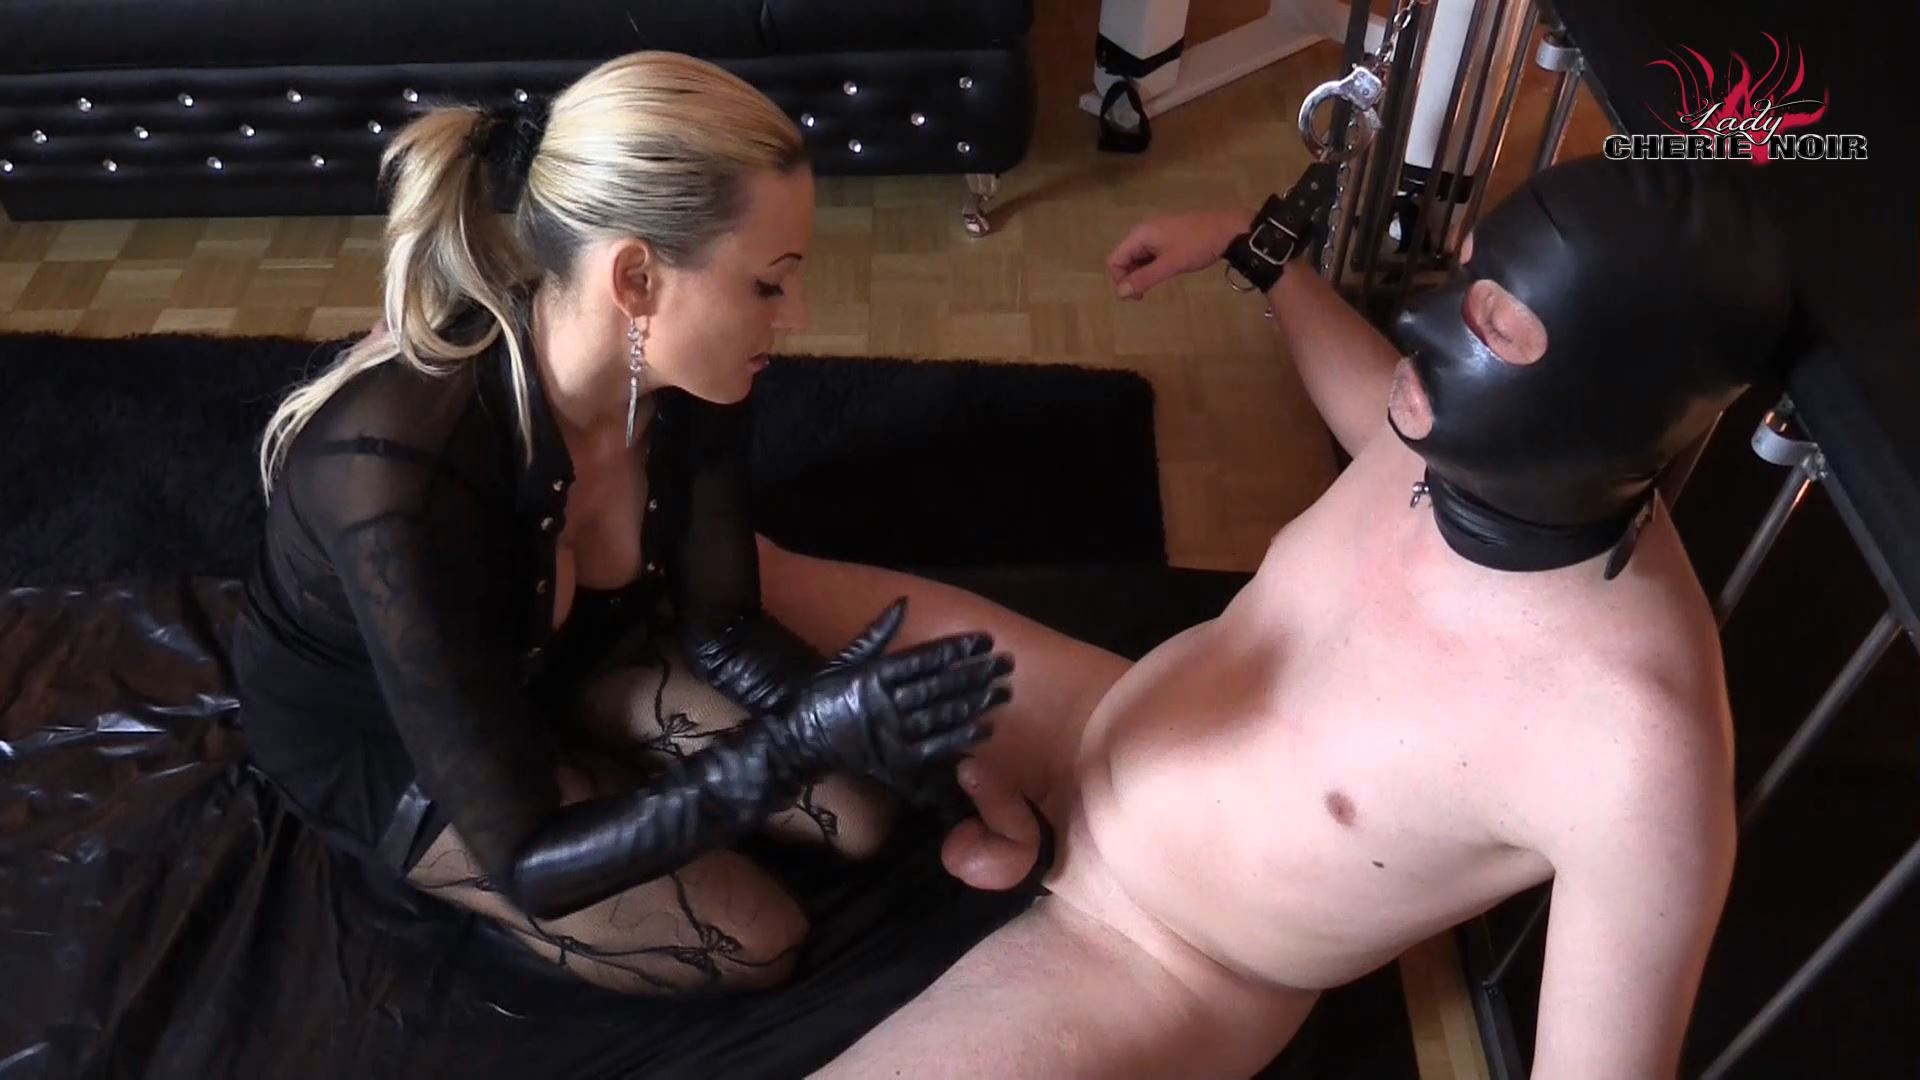 CHERIE NOIR In Scene: Leather CBT Cock torture and long leather gloves - CHERIENOIR - FULL HD/1080p/MP4